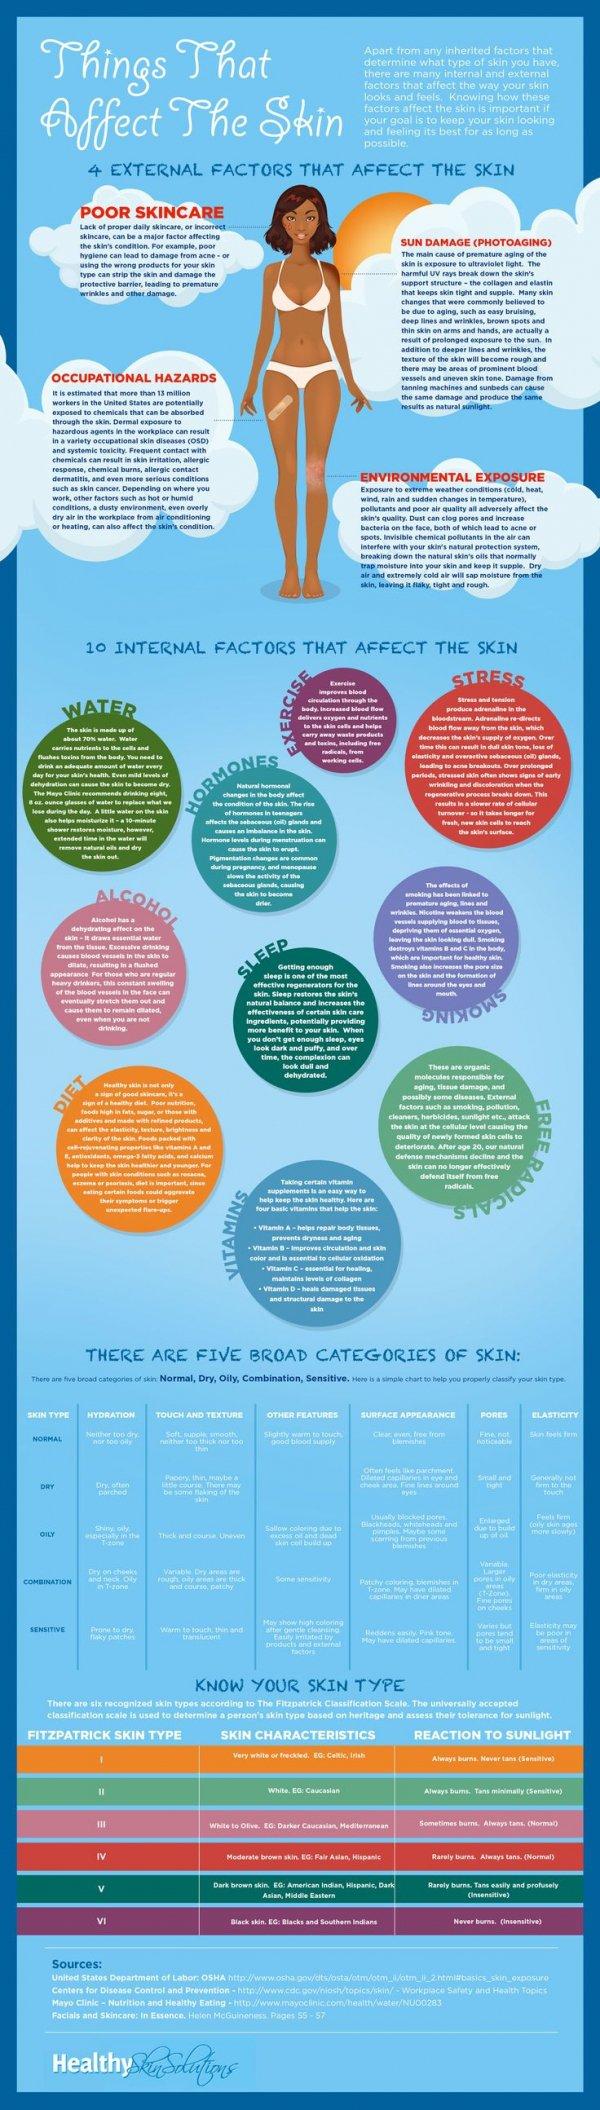 biology,poster,advertising,screenshot,illustration,